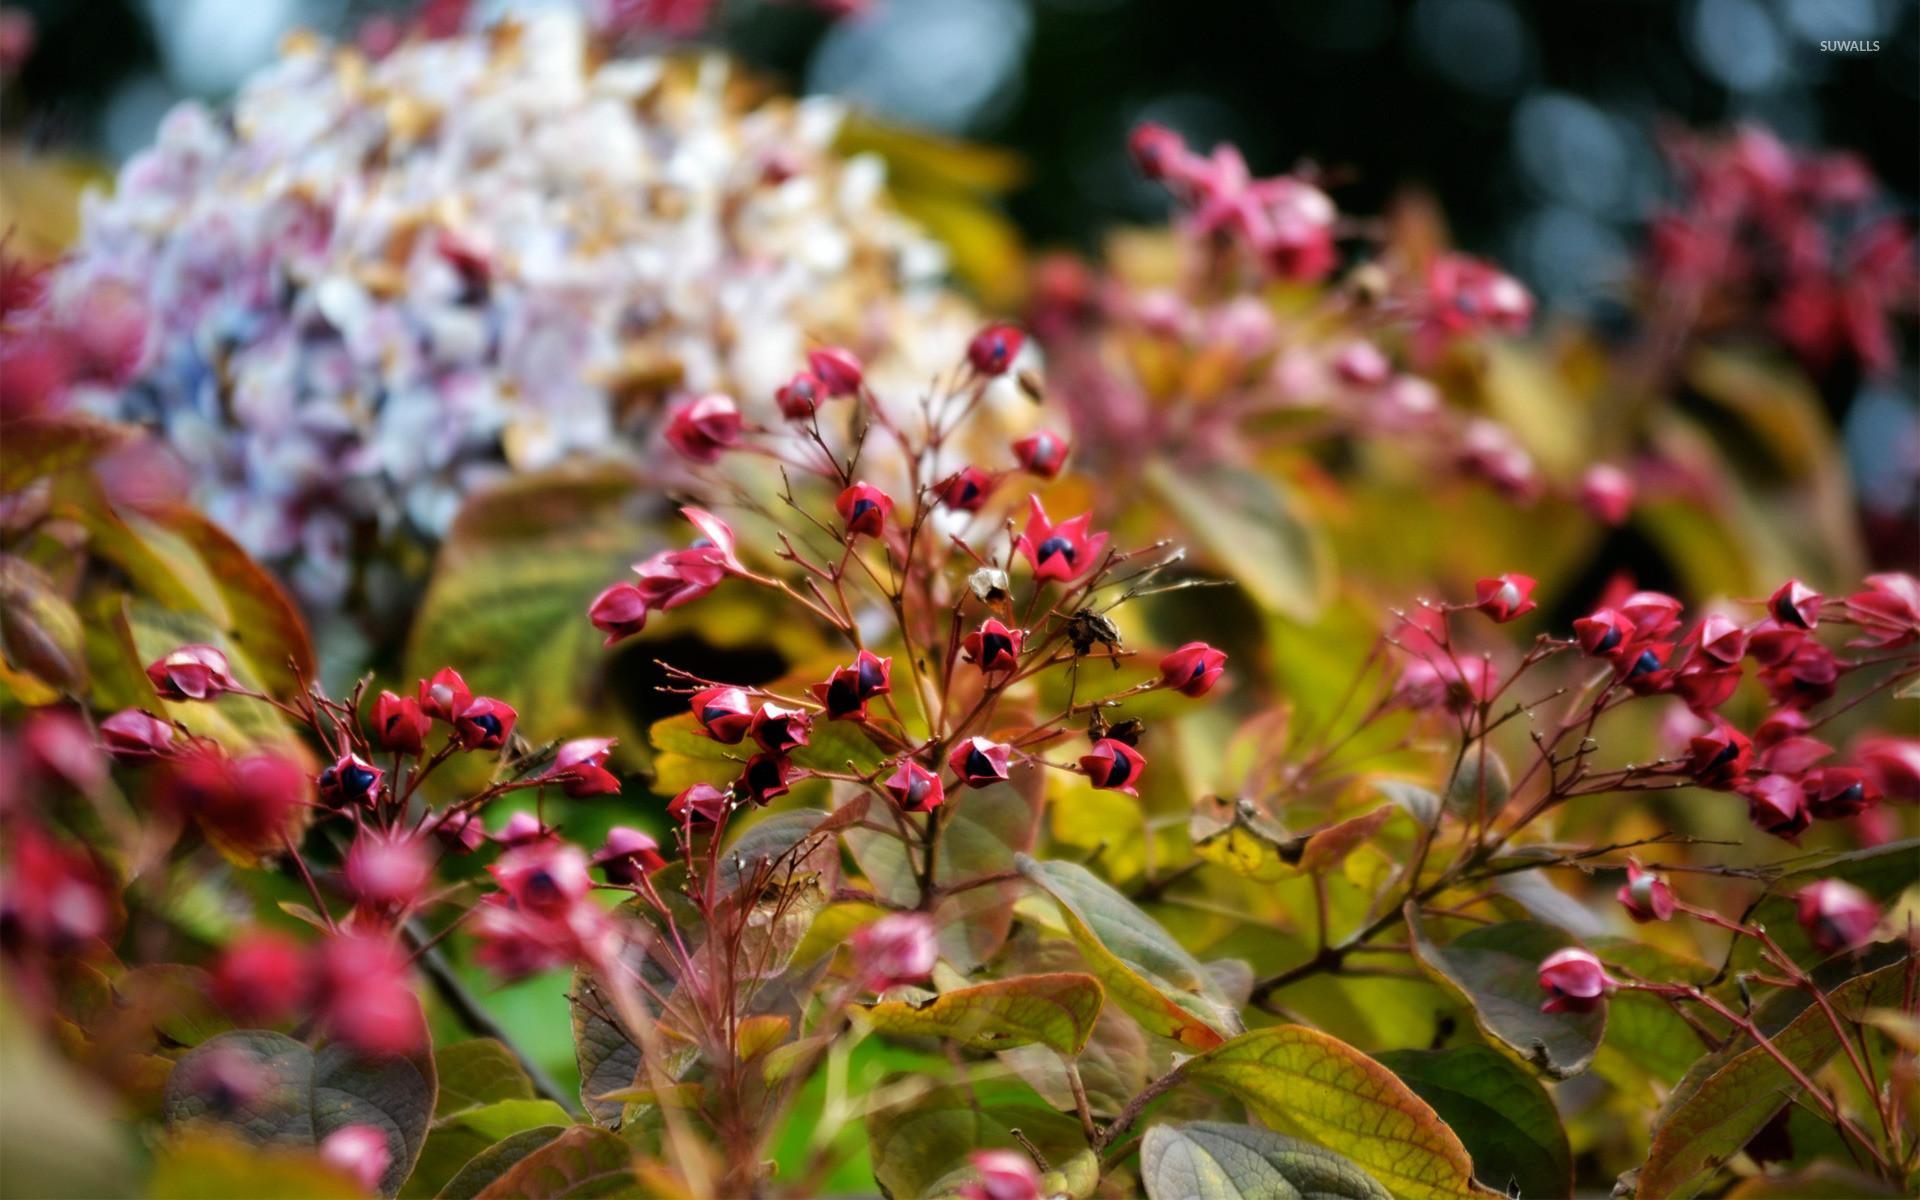 Autumn flowers and berries wallpaper jpg